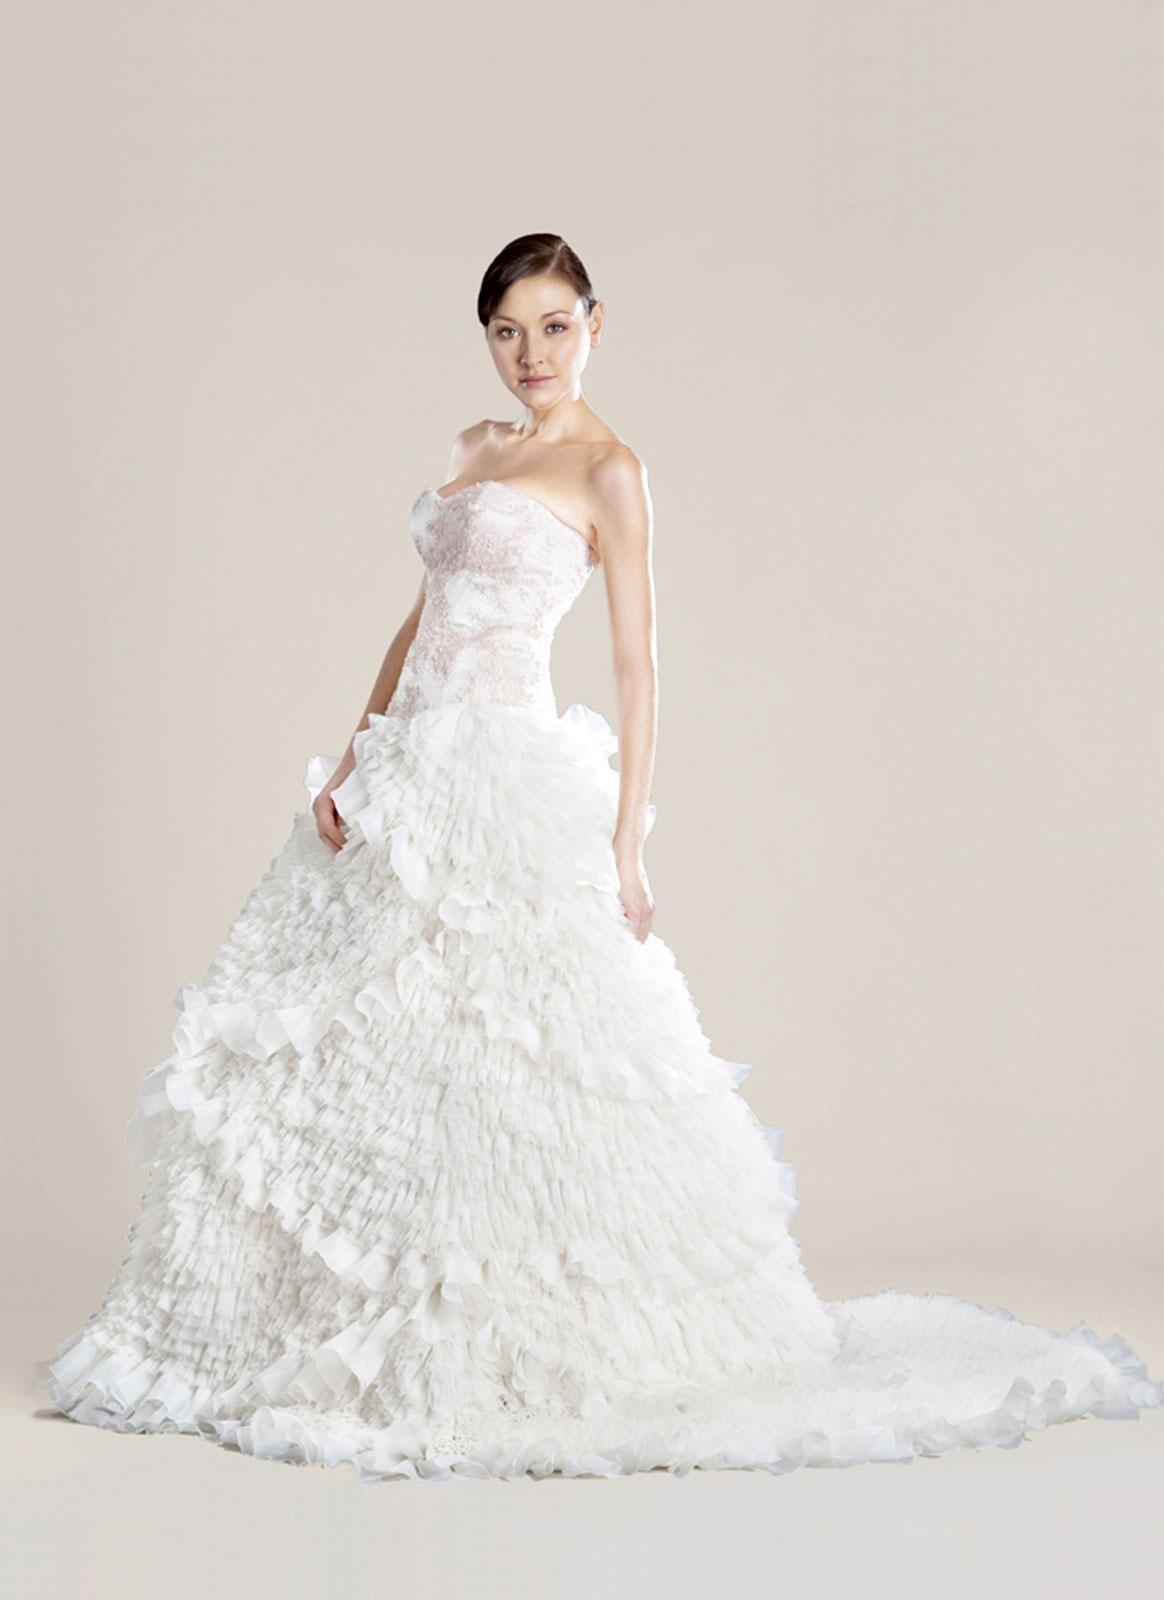 Bridal Hair Mn Bridal Gowns Binghamton Ny Full Length